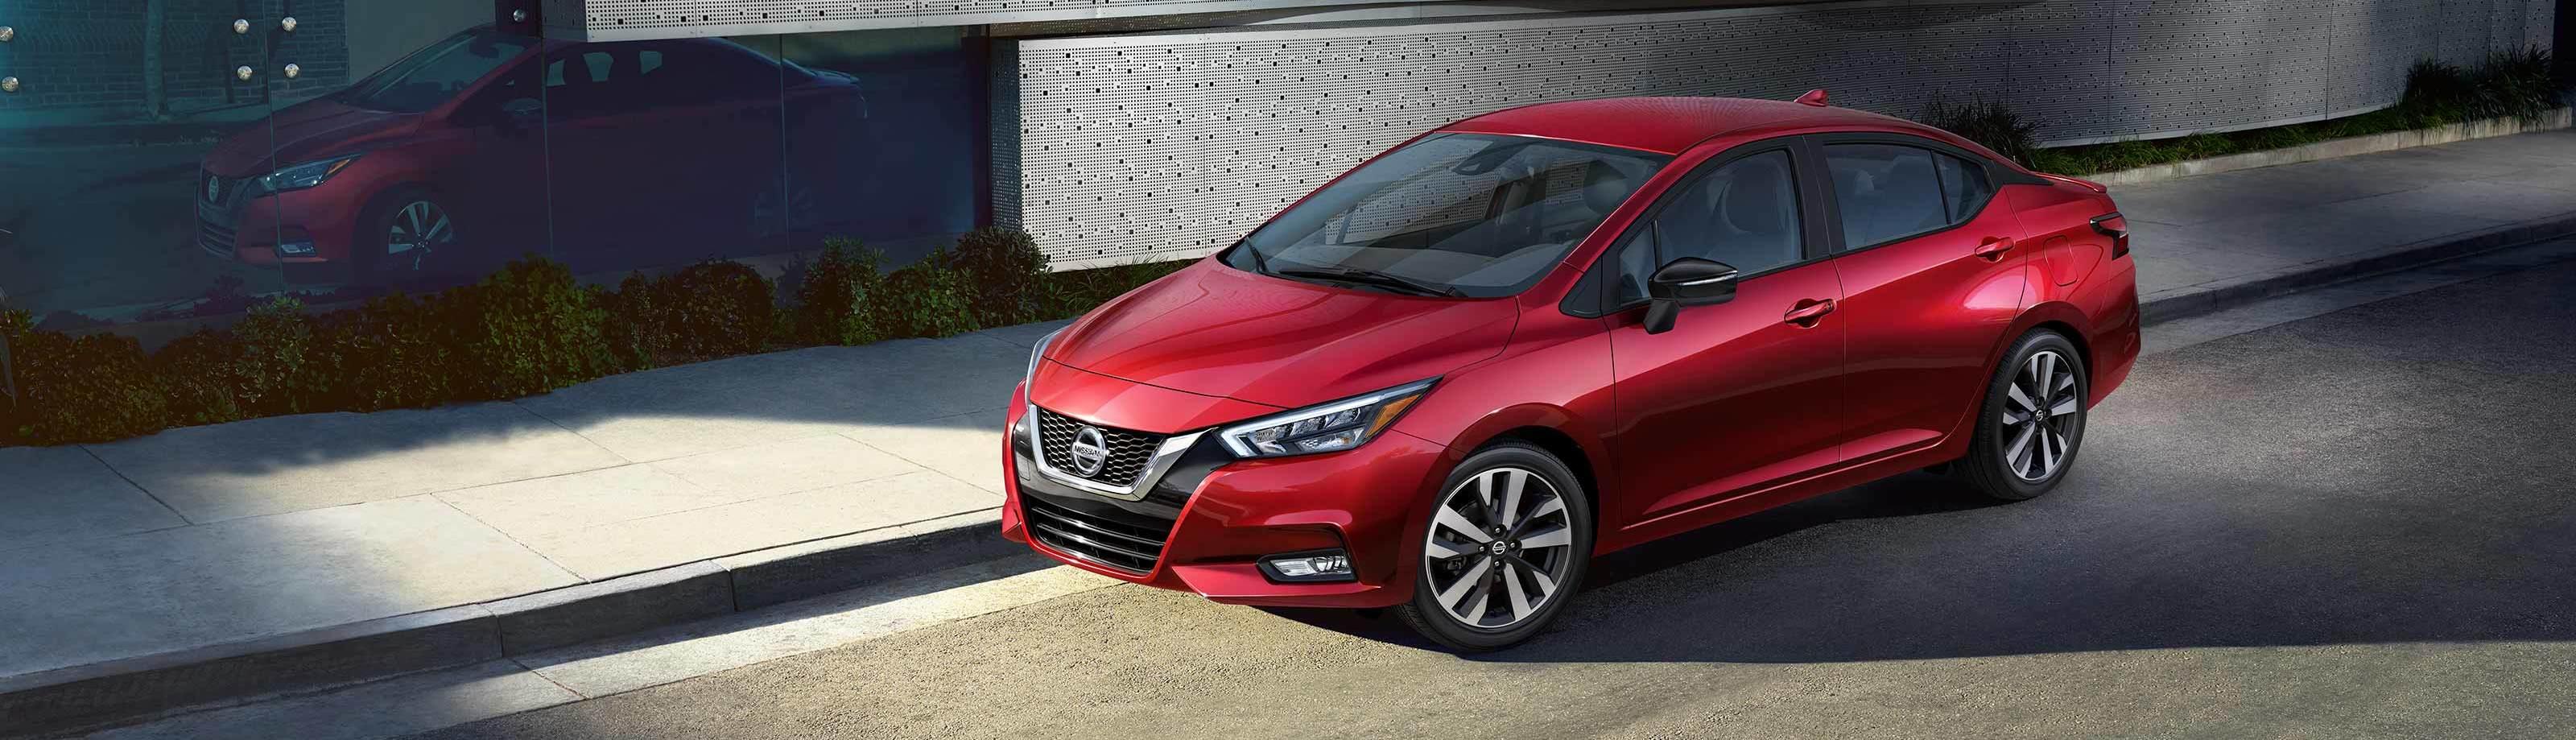 2020 Nissan Versa for Sale near Annandale, VA